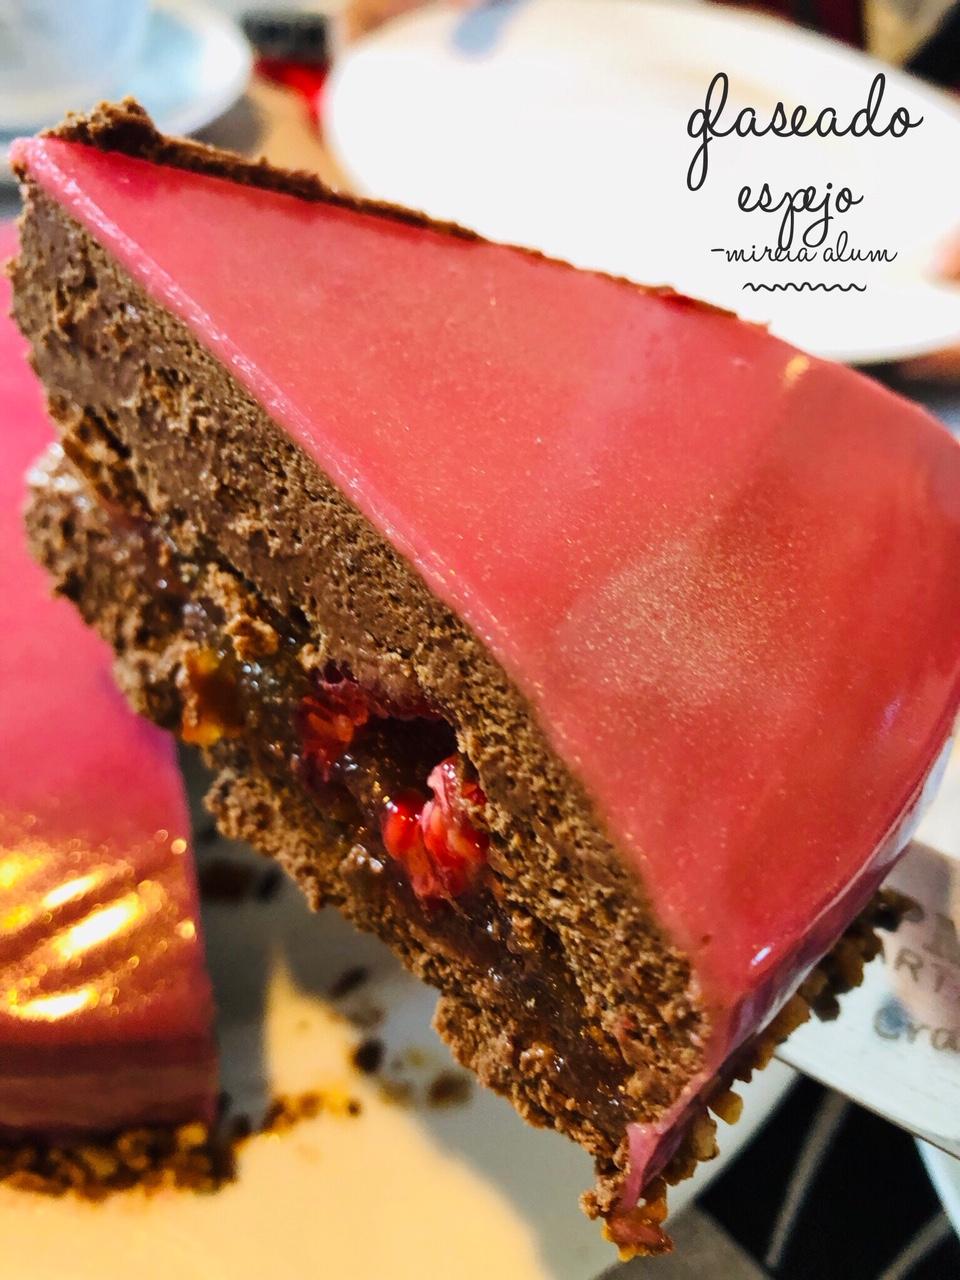 tarta de mousse de chocolate negro con glaseado espejo